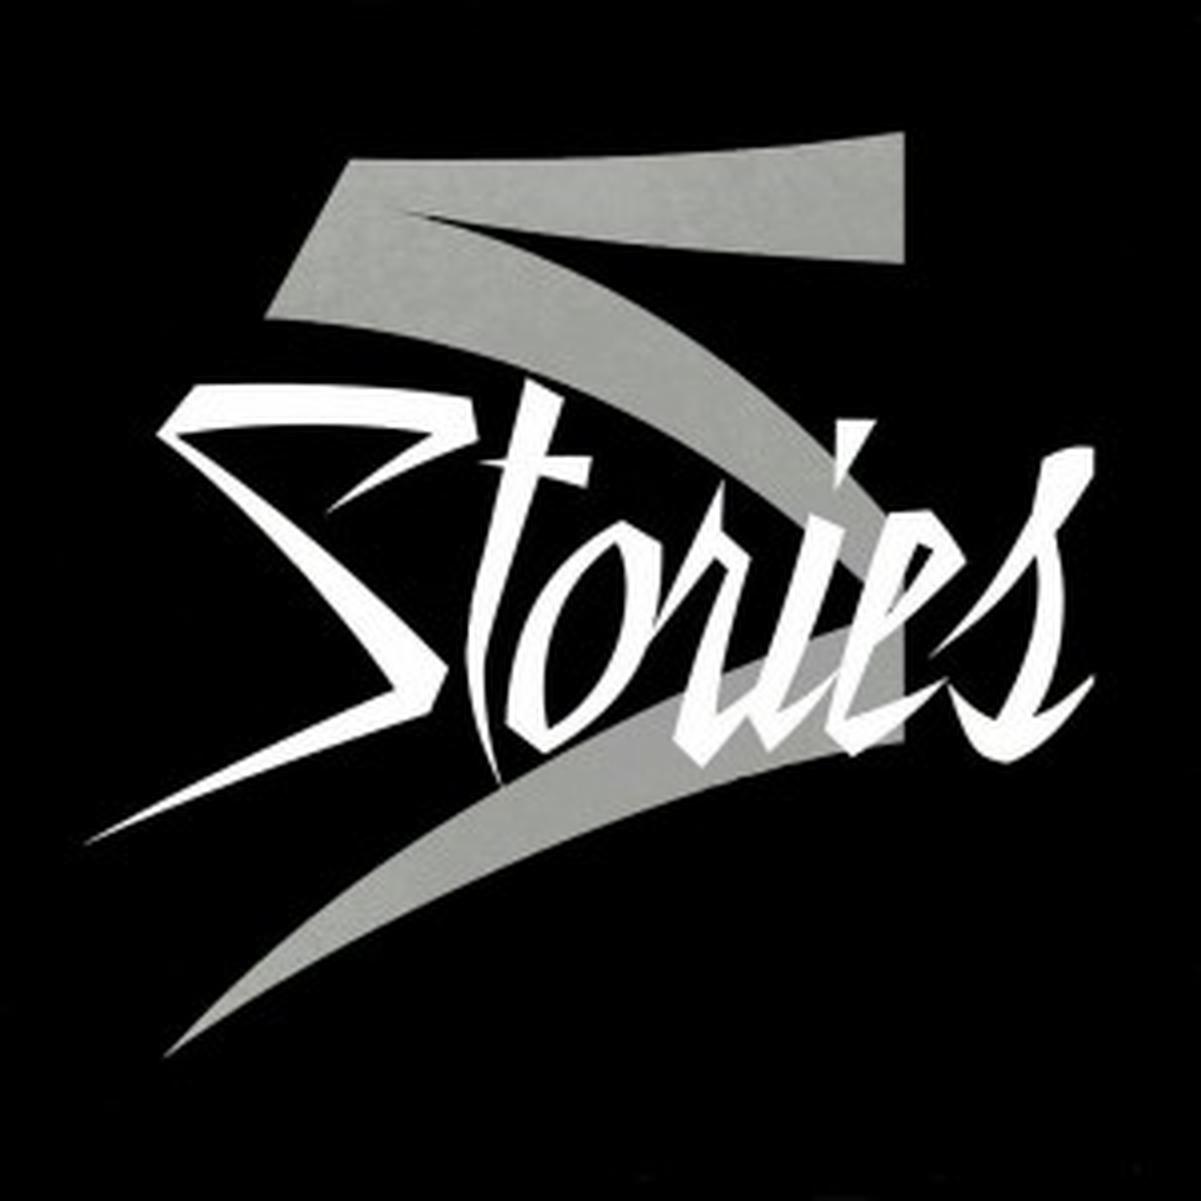 5Stories